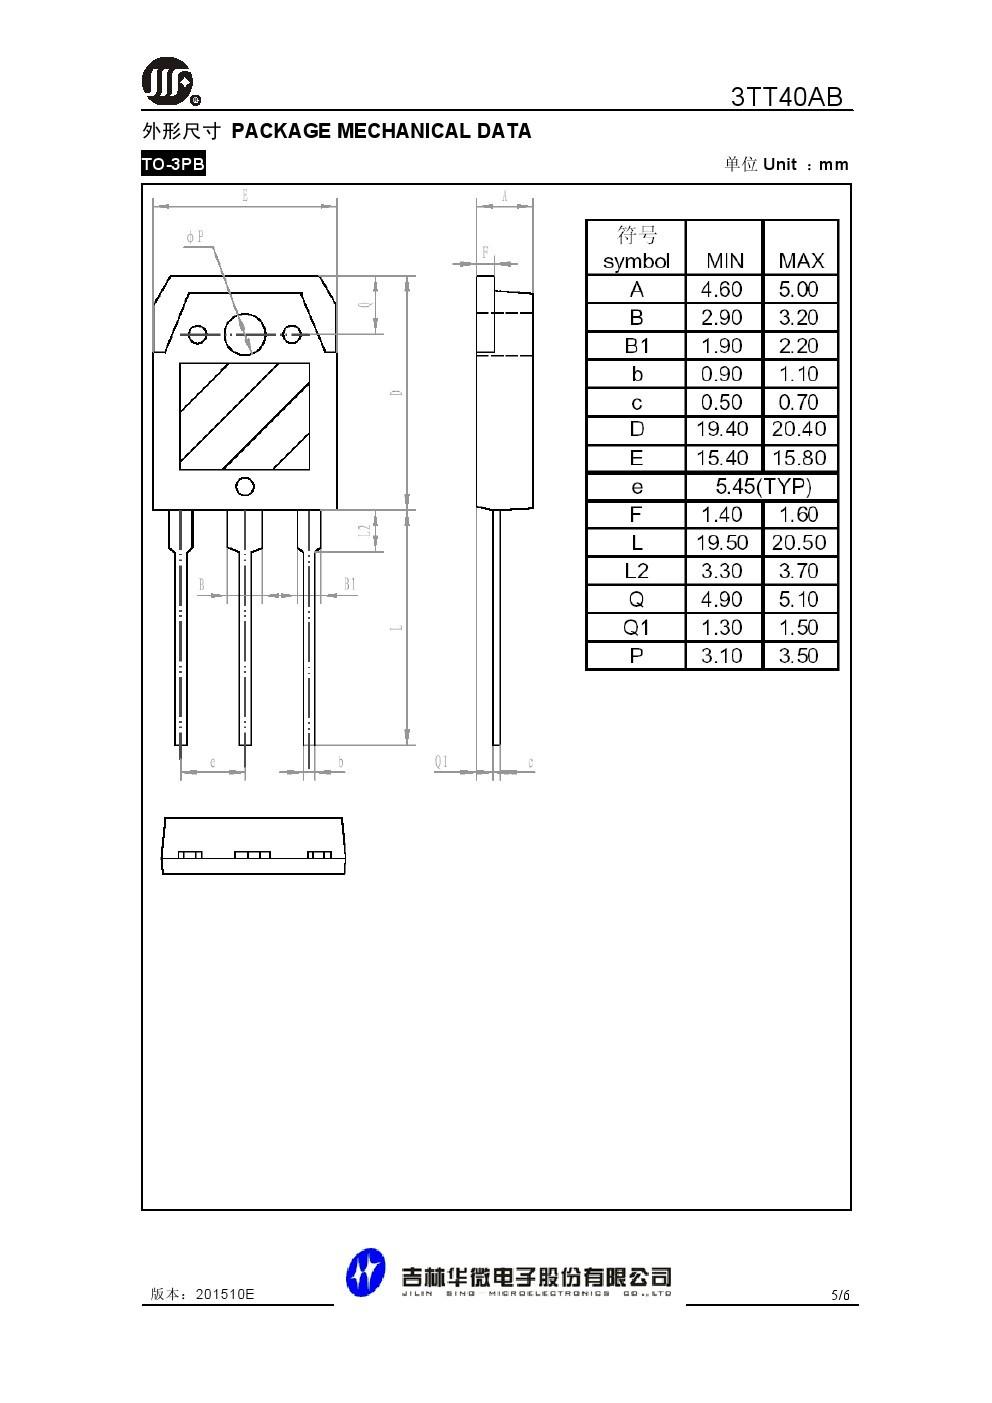 3tt40ab triac 40a 800v triode ac semiconductor switch